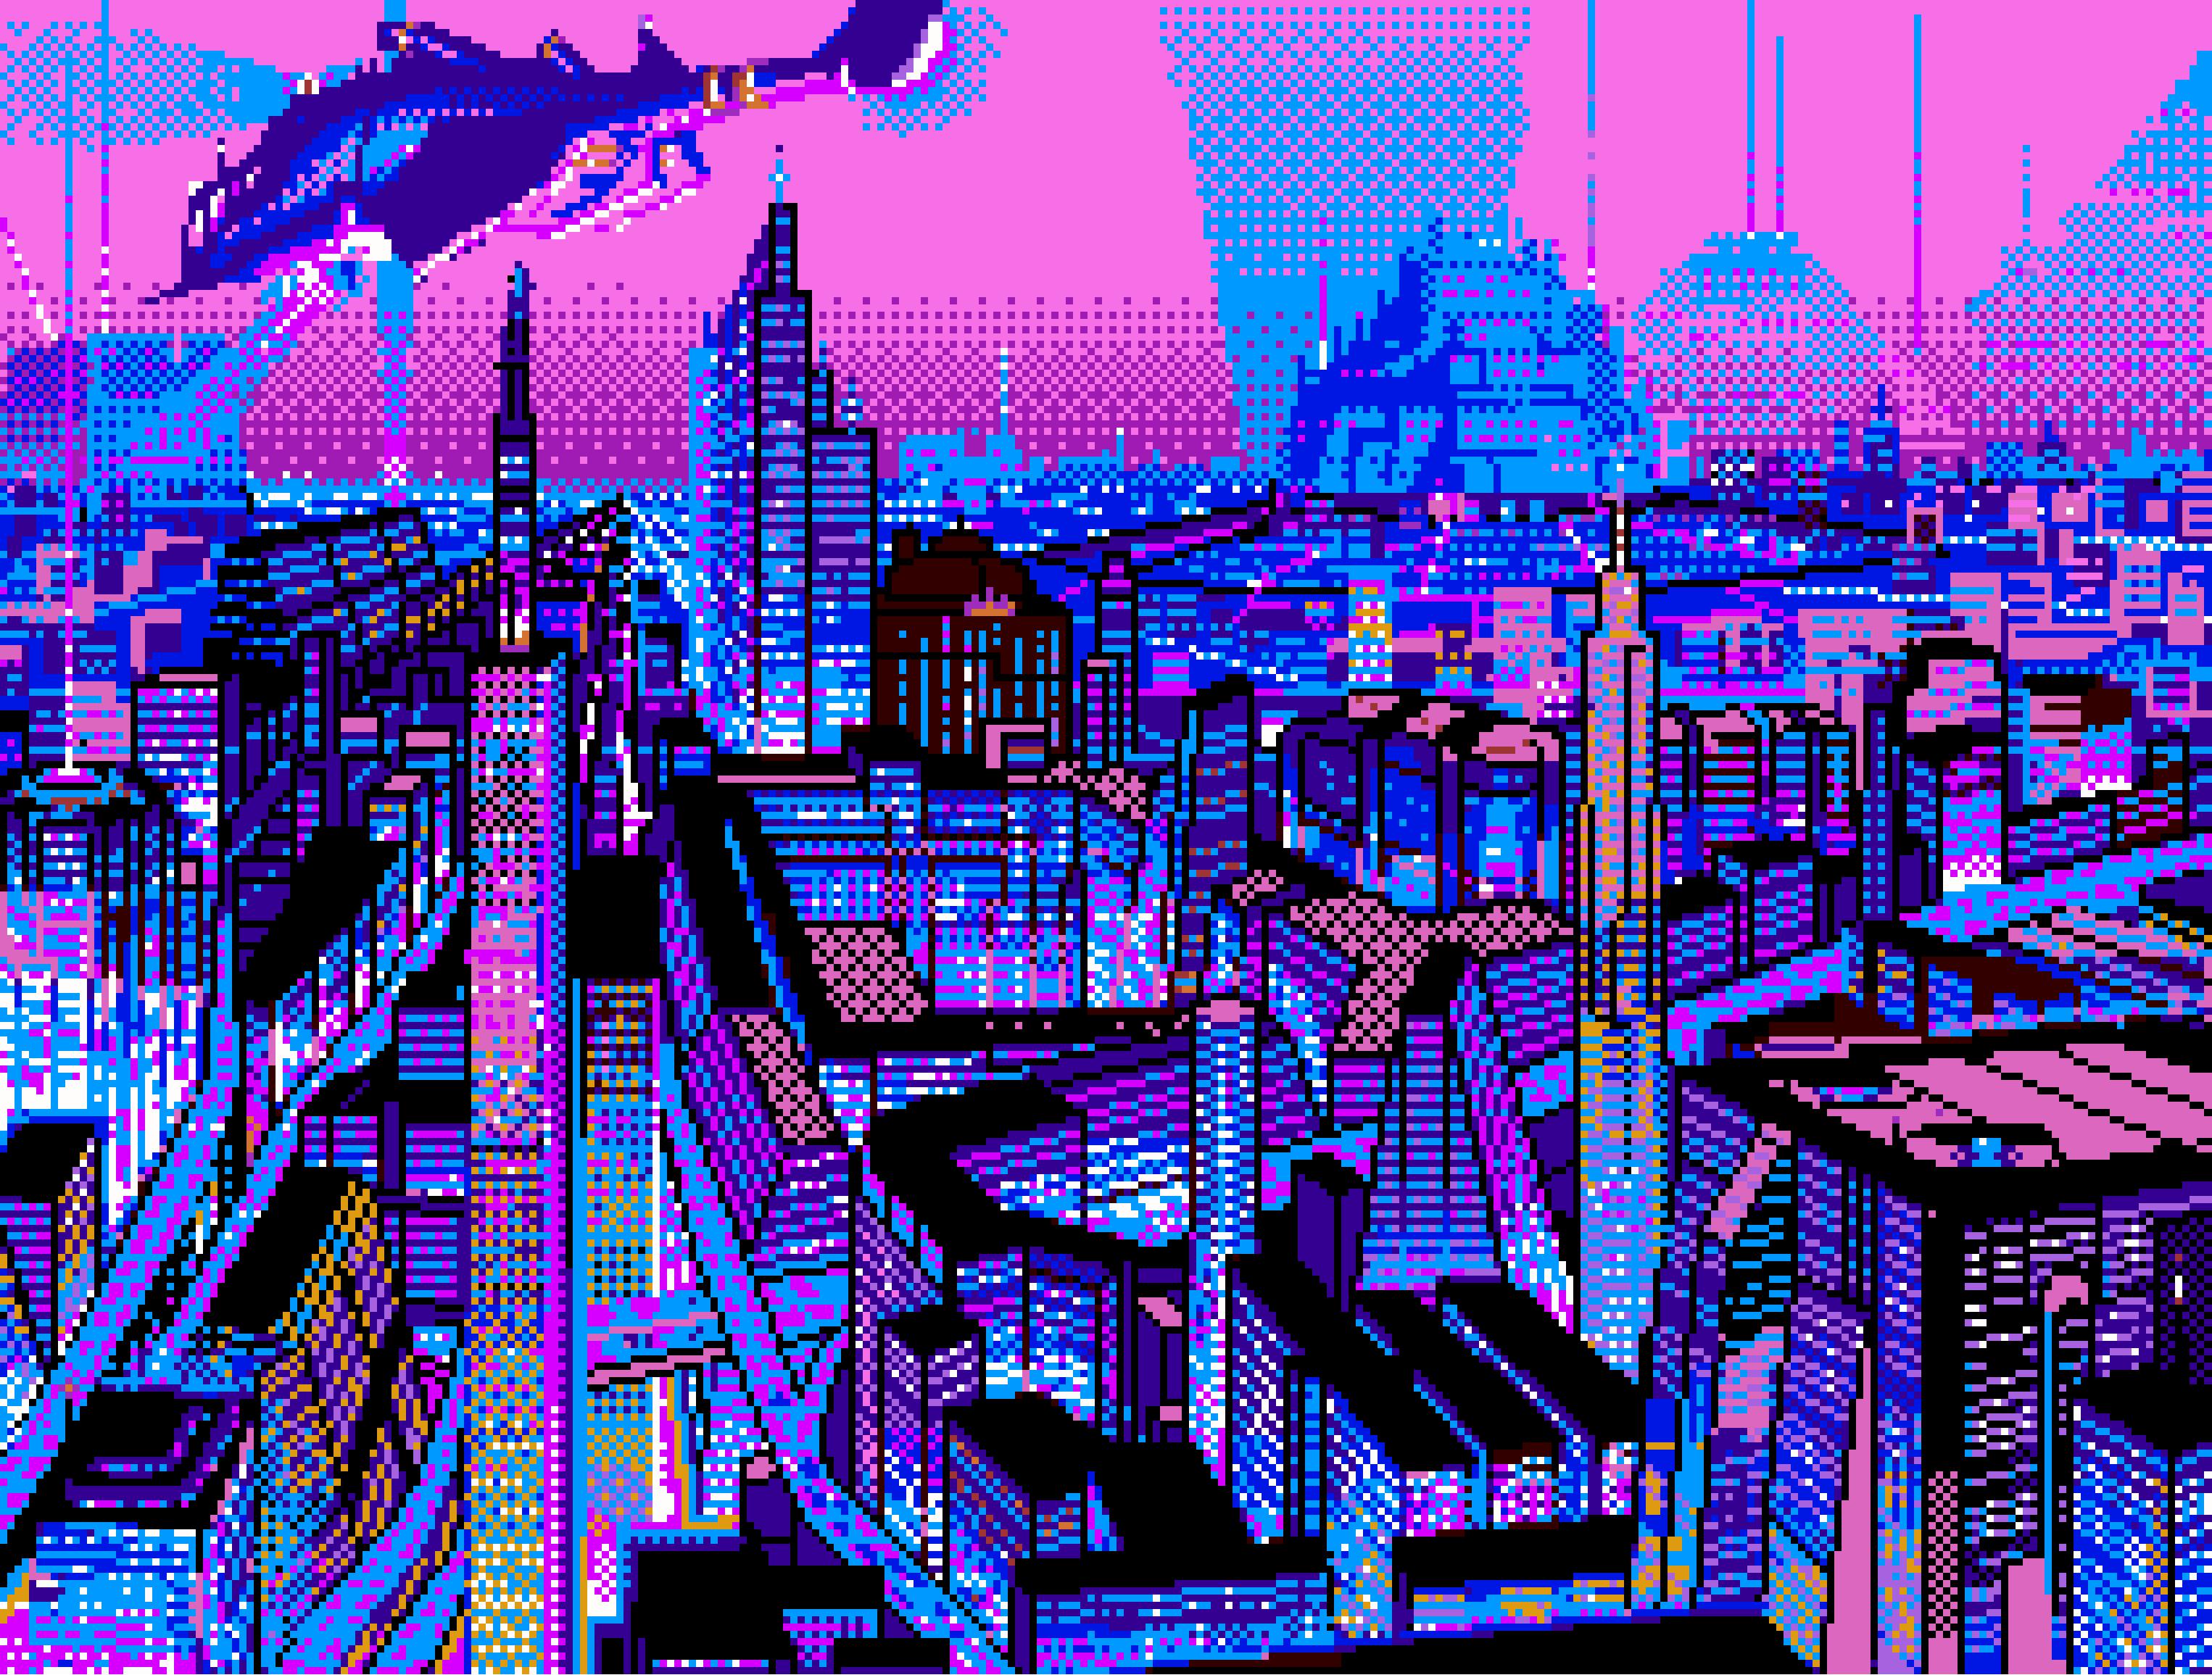 2D Pixel Art Pixel art, Vaporwave, Glitch art